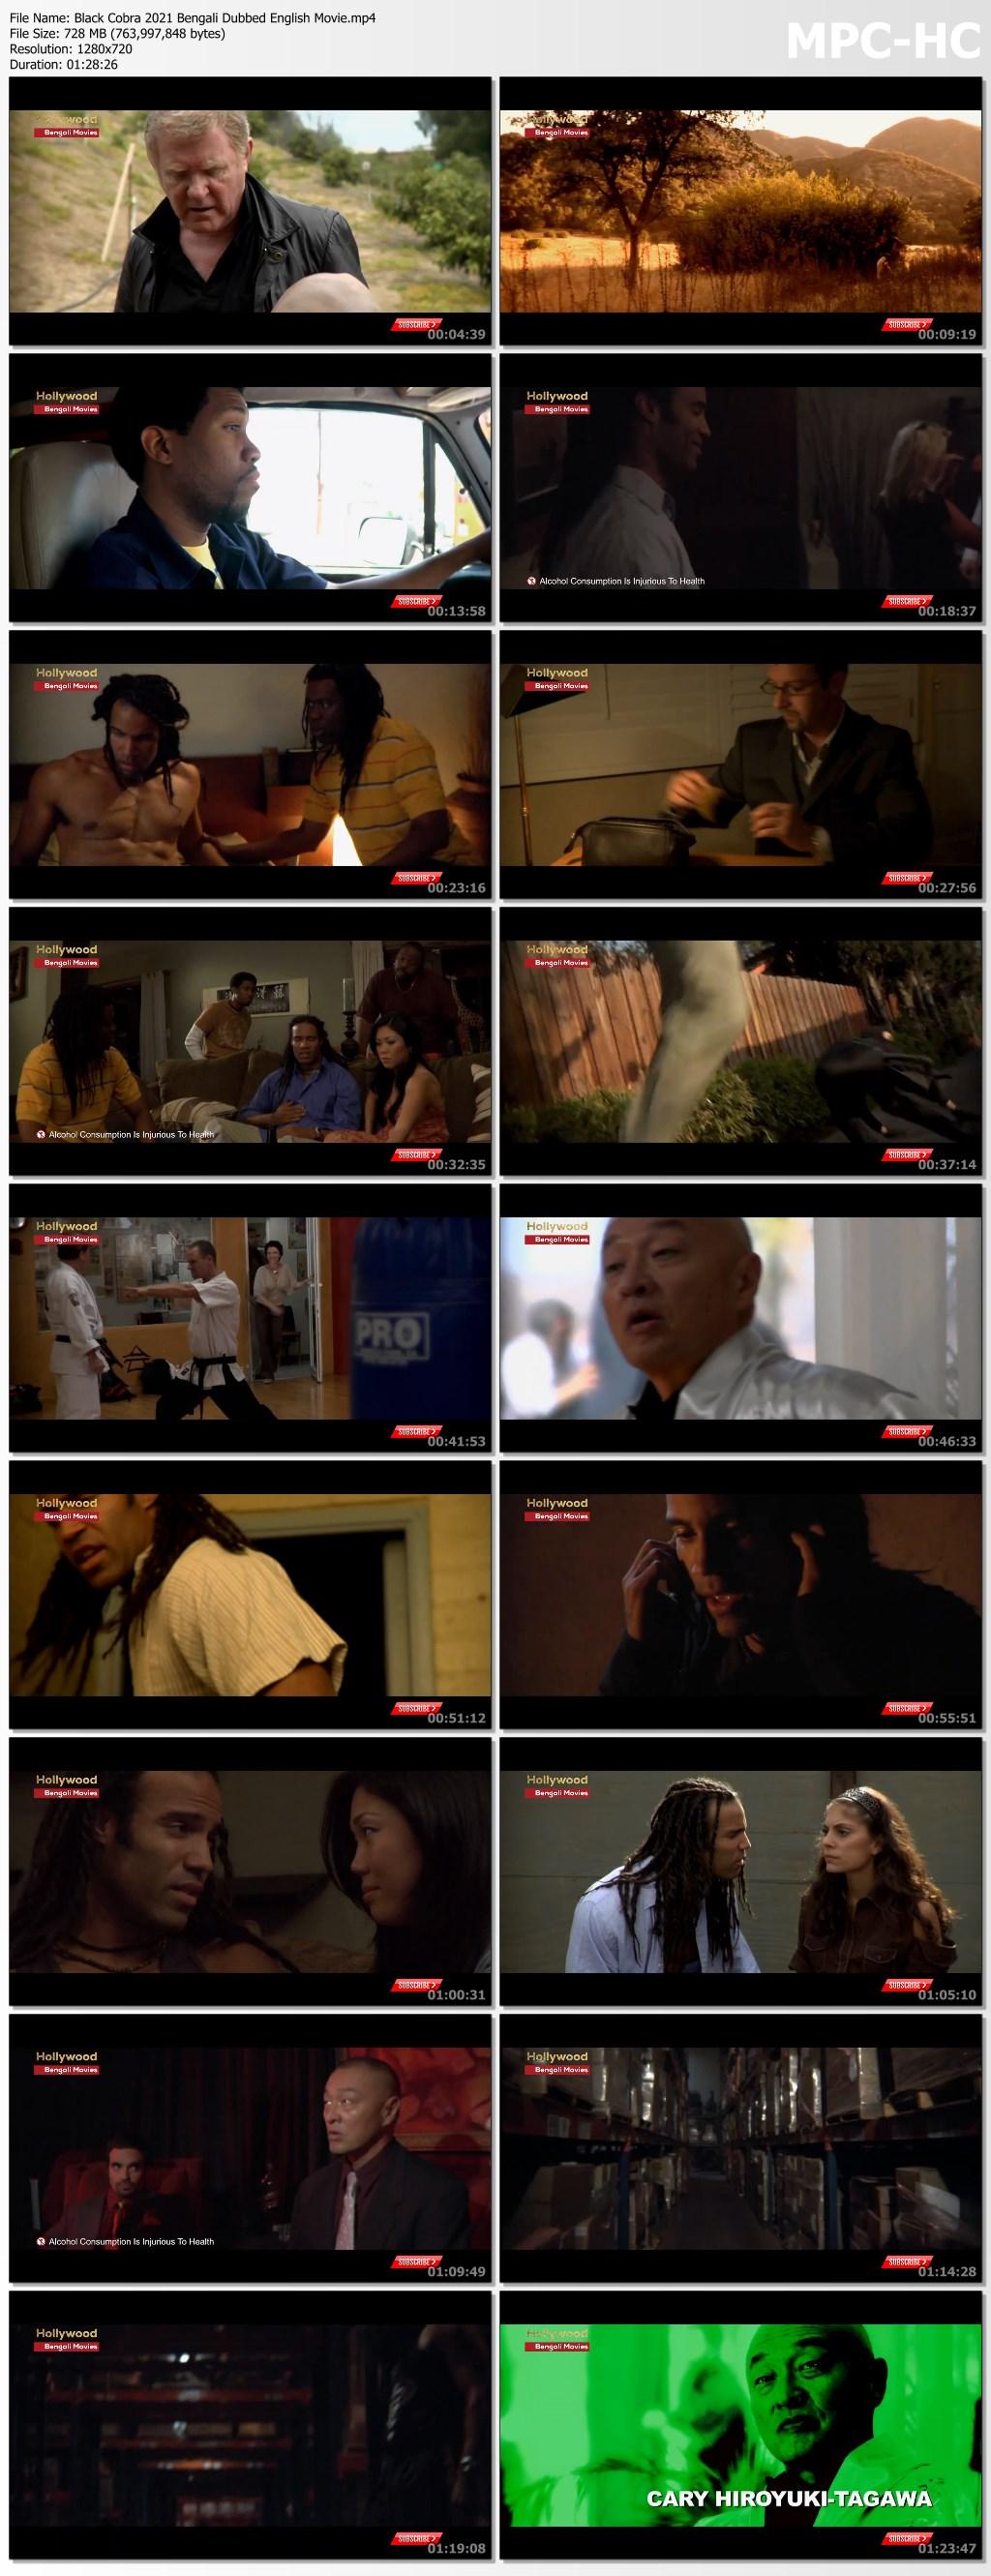 Black Cobra 2021 Bengali Dubbed English Movie.mp4 thumbs